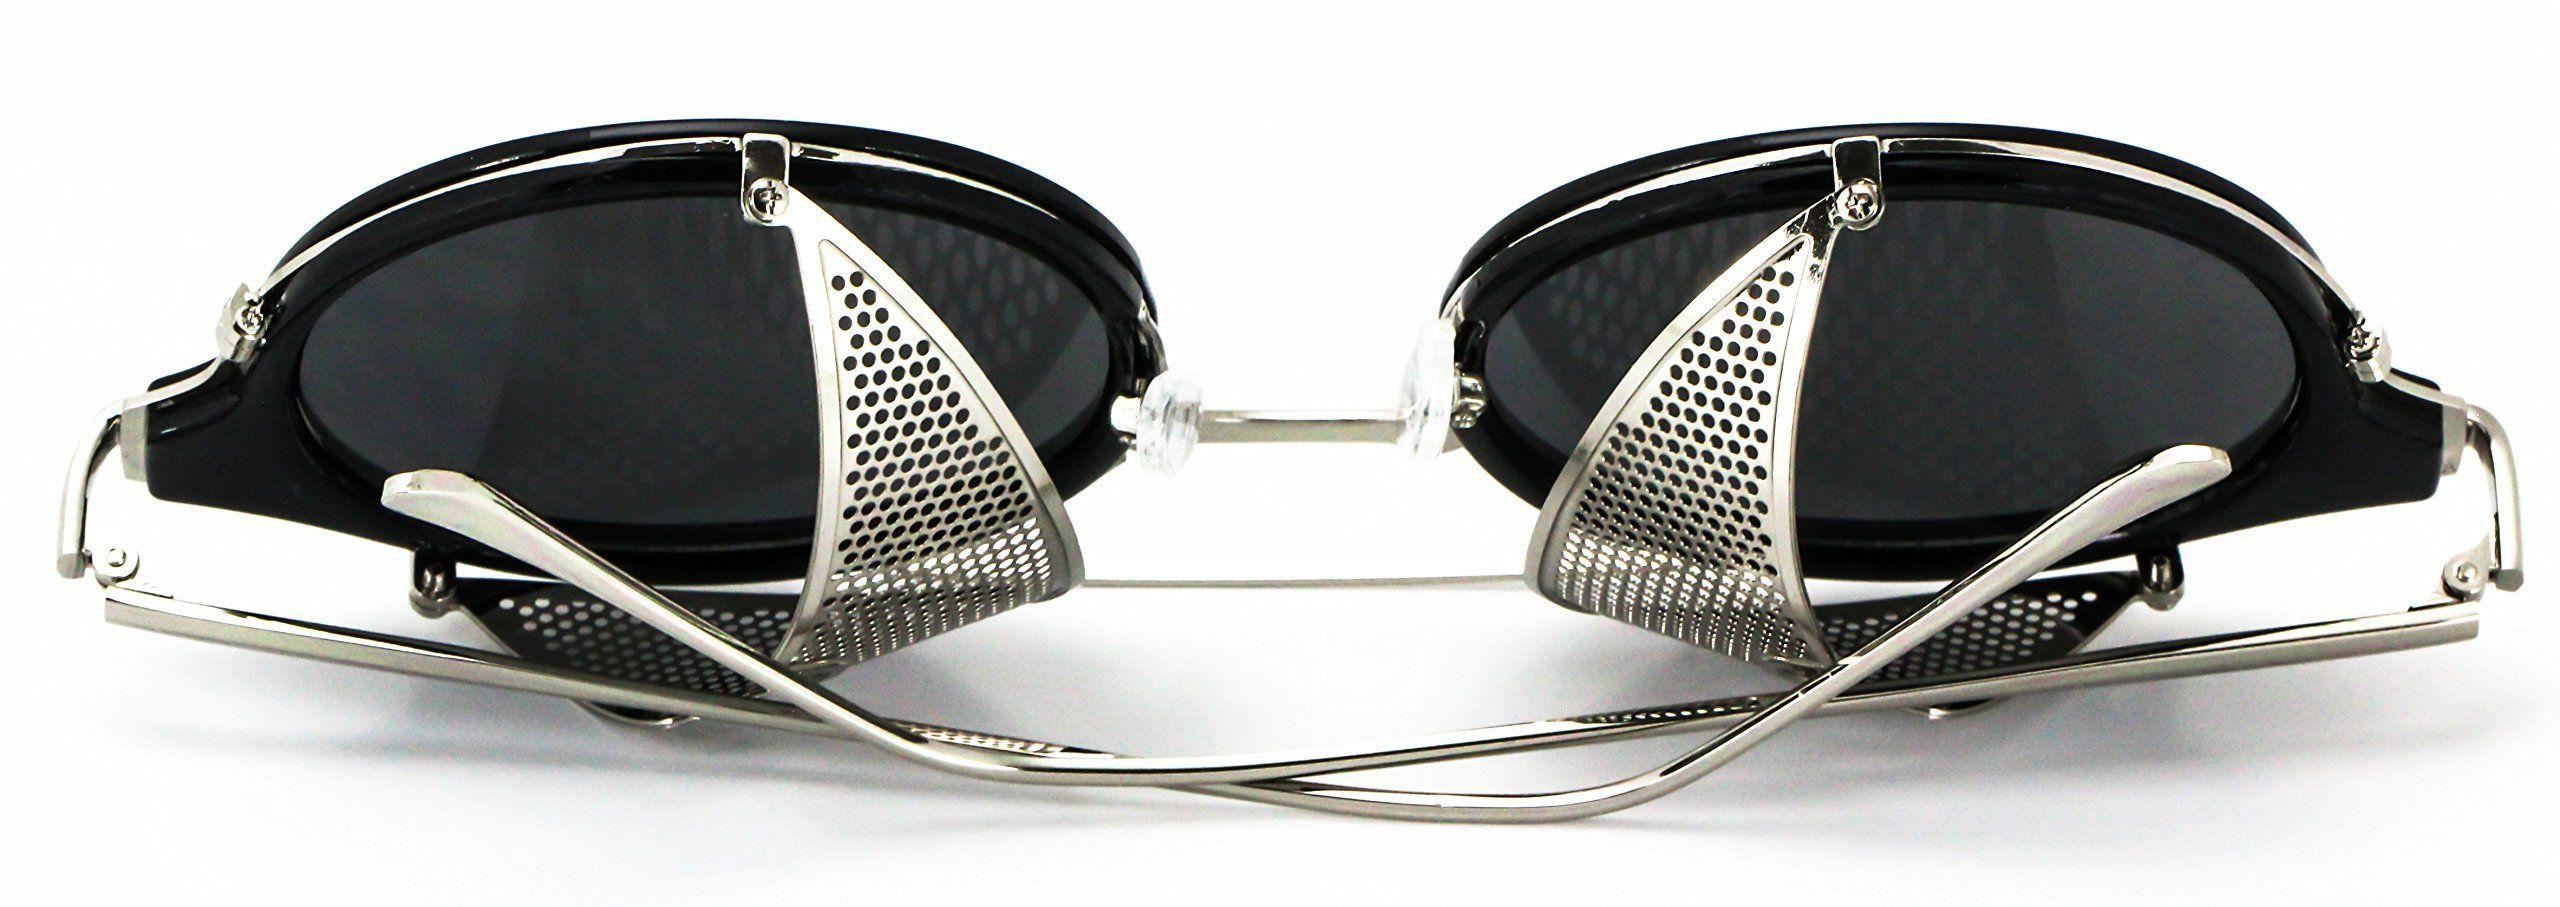 Elite sunglasses side shield steampunk vintage cool uv